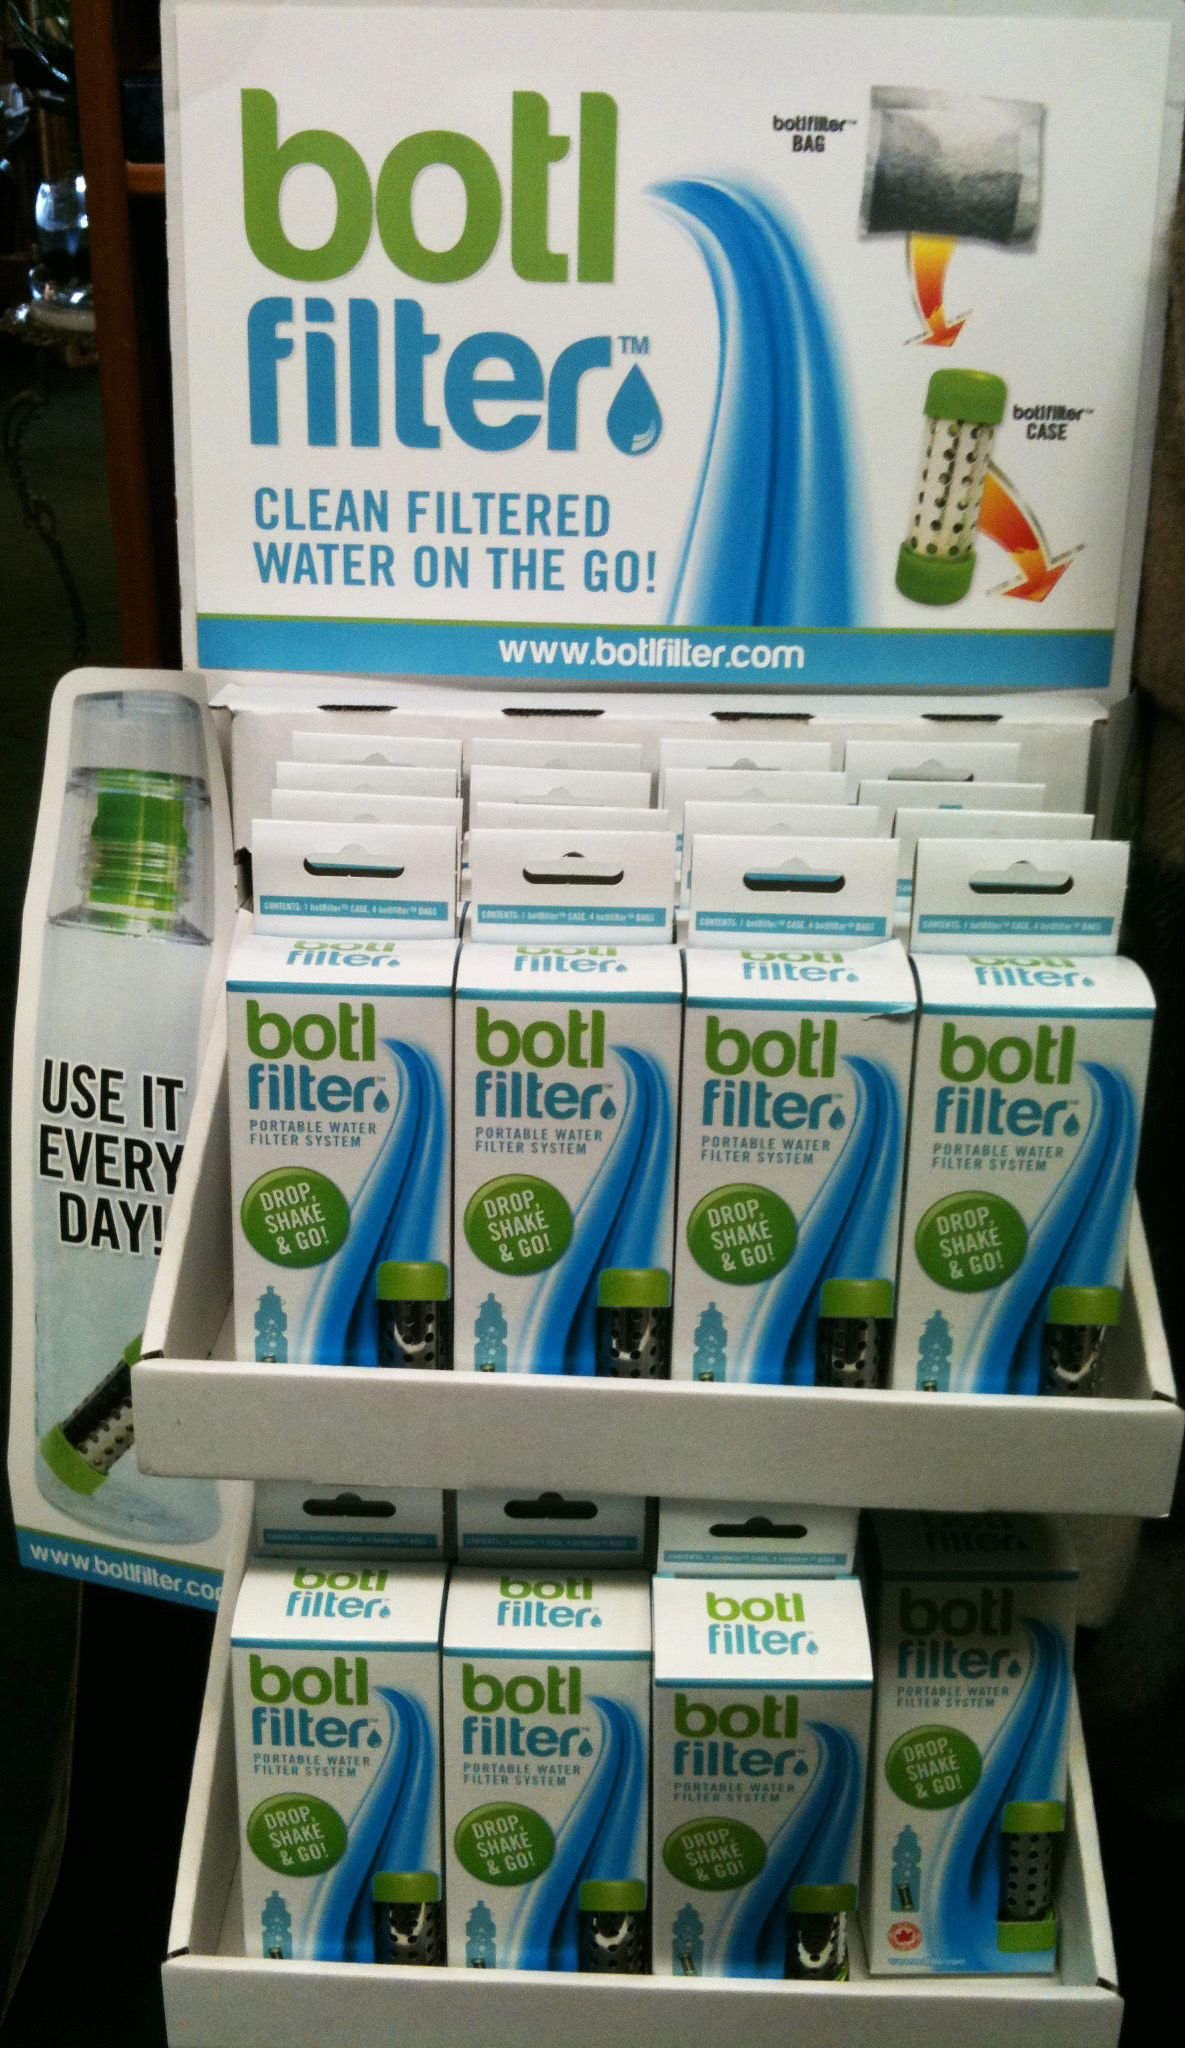 portable filtration wherever you go